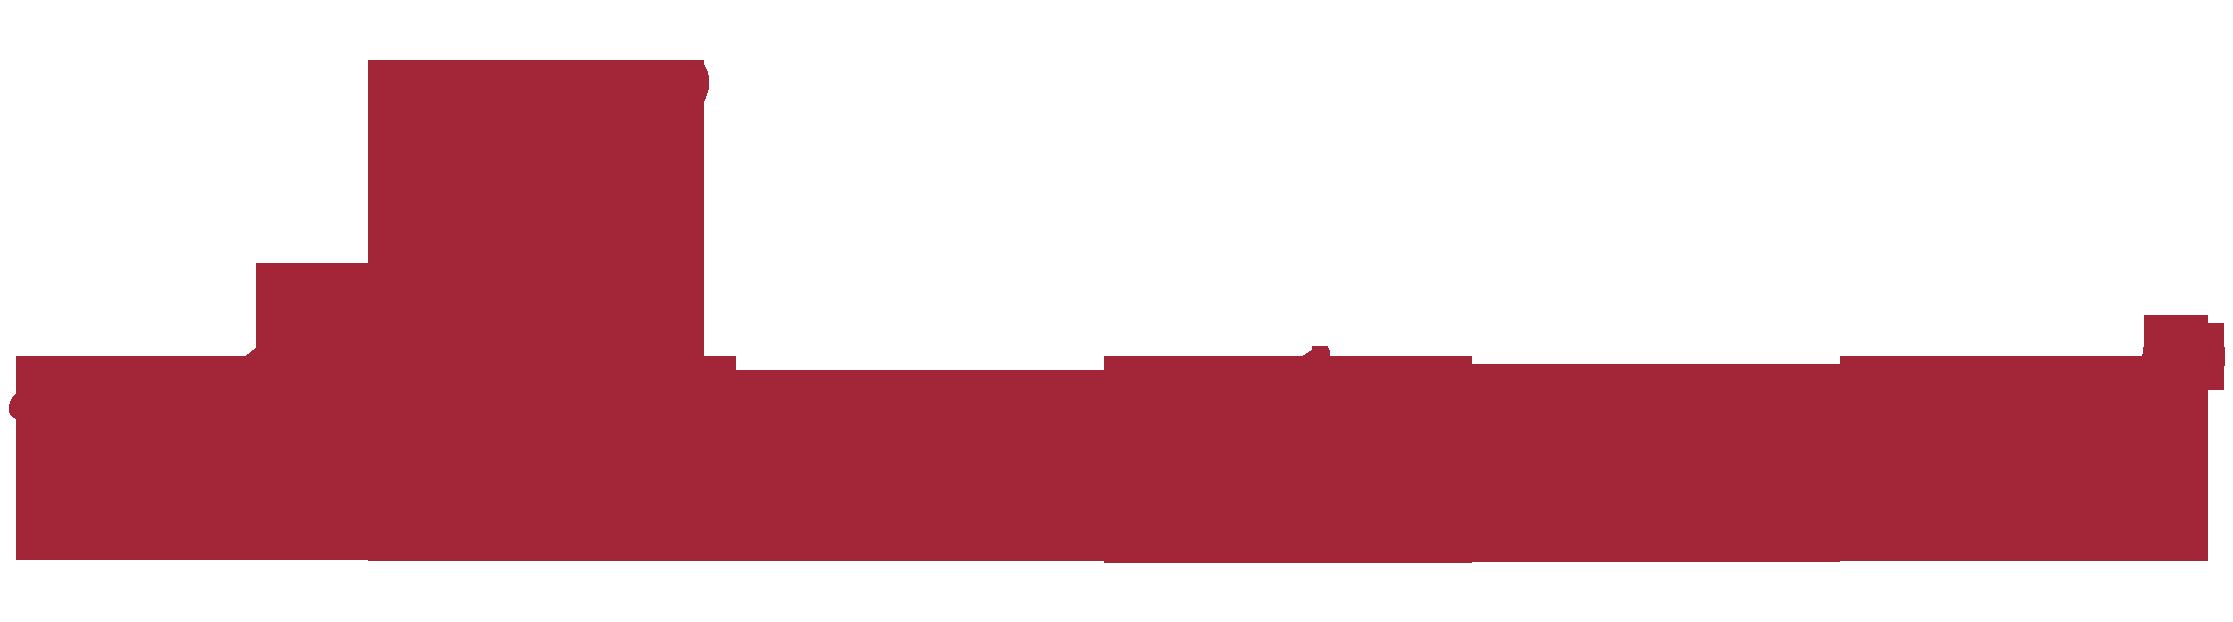 Amarena logo